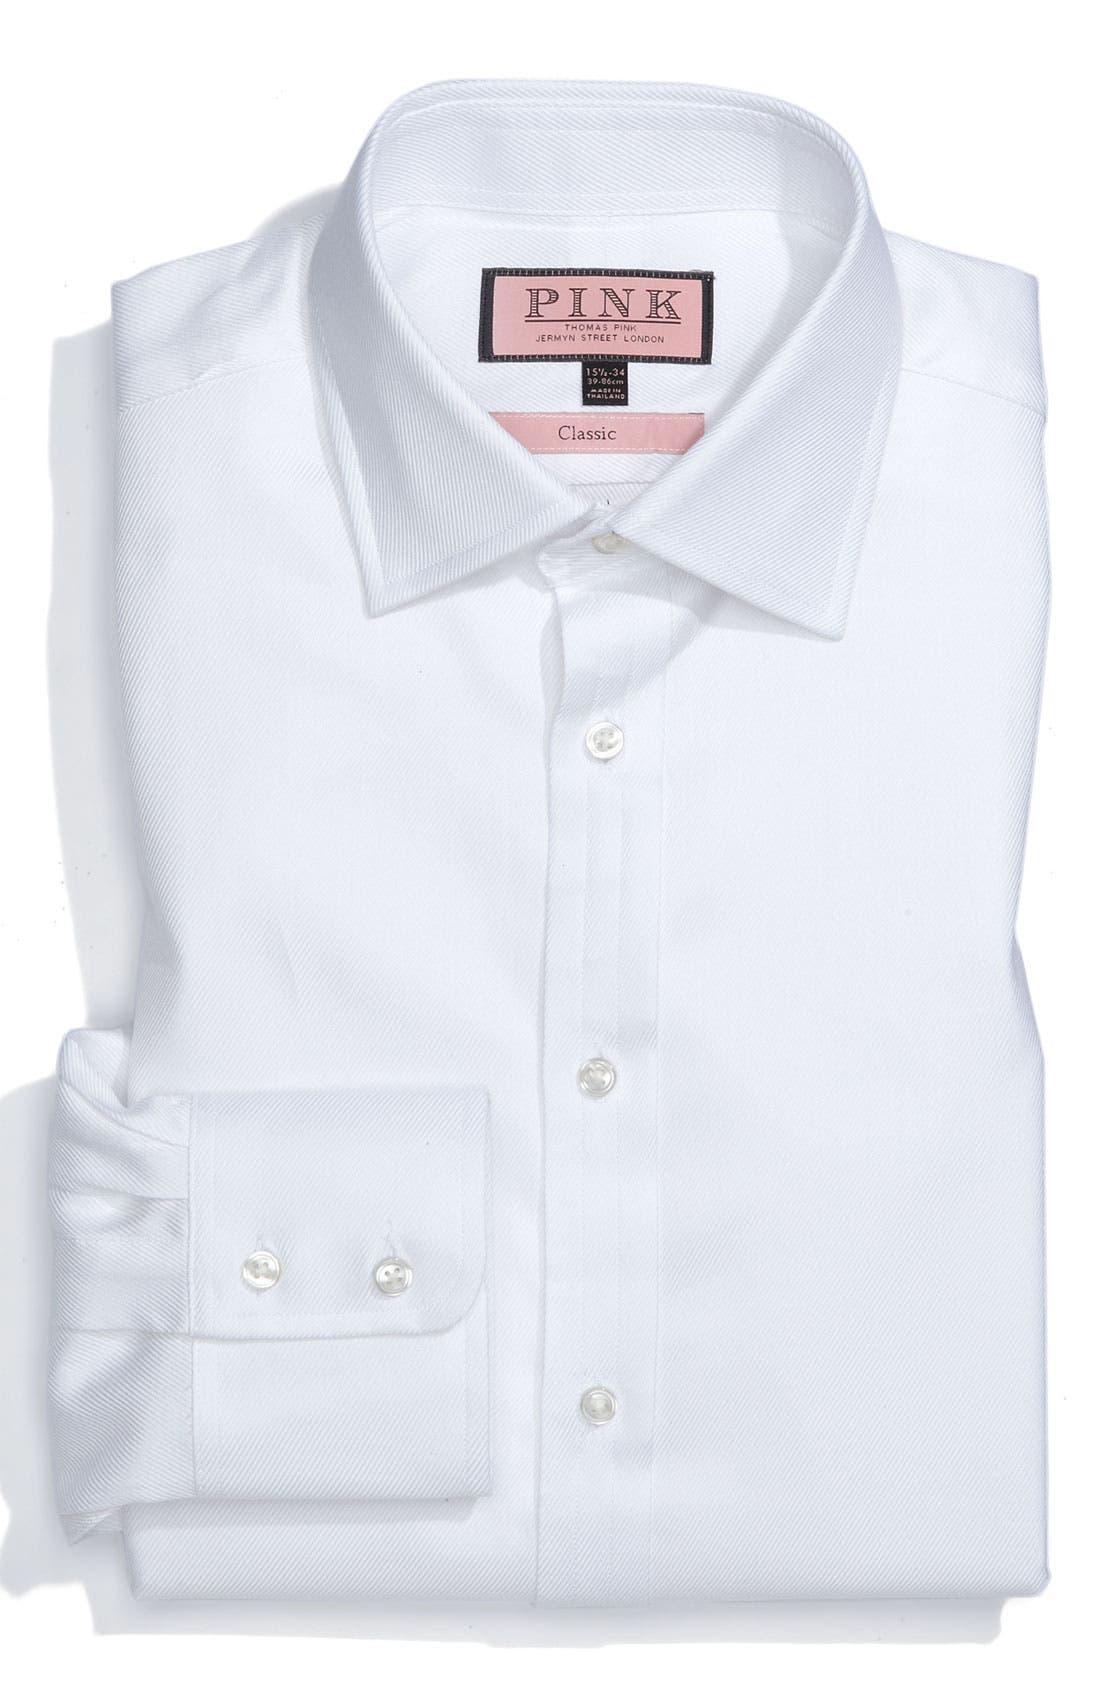 Alternate Image 1 Selected - Thomas Pink Classic Fit Dress Shirt